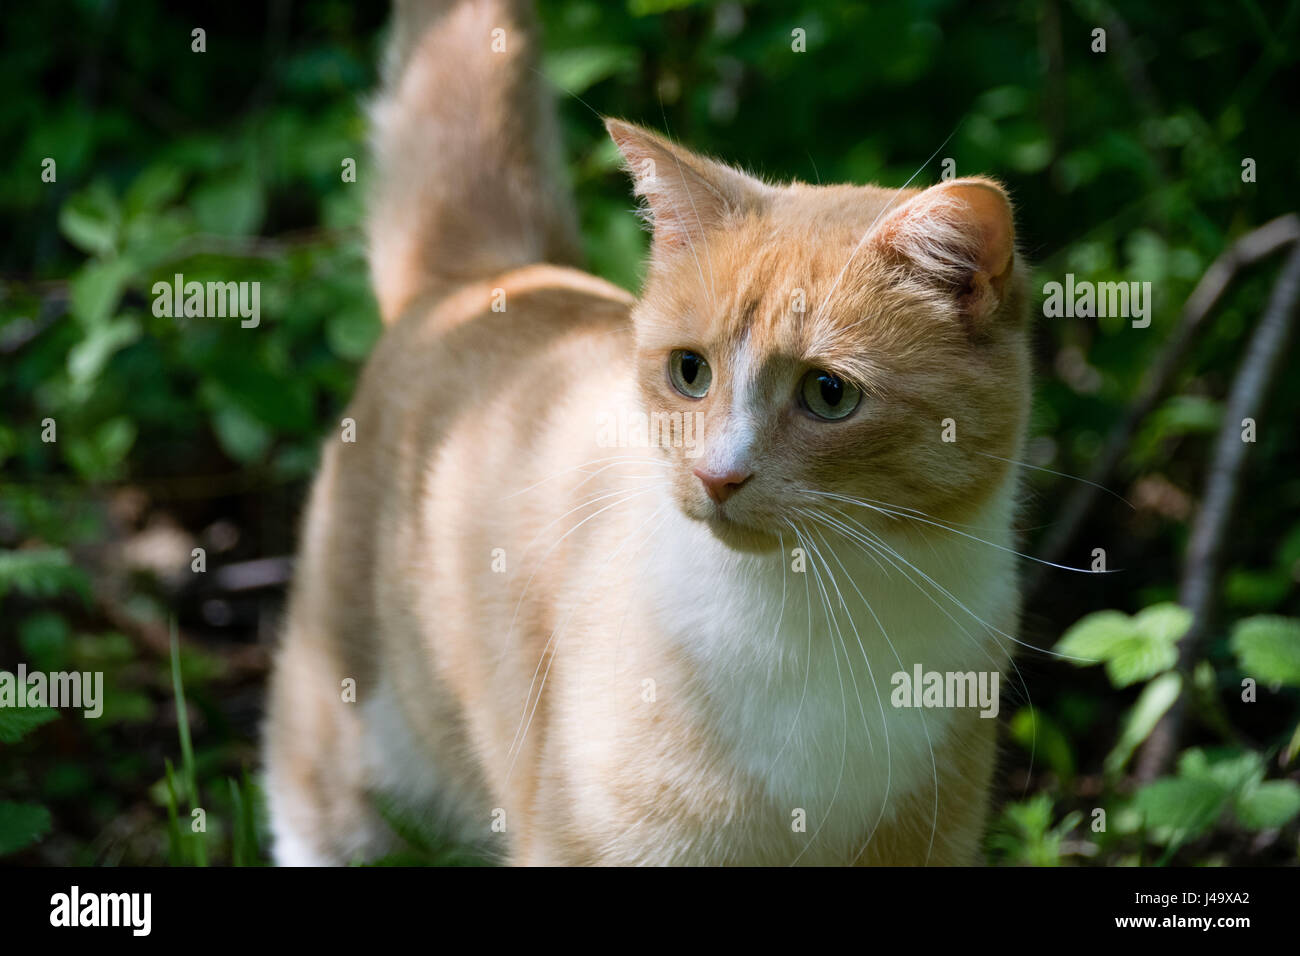 Domestic ginger cat exploring an over grown garden - Stock Image